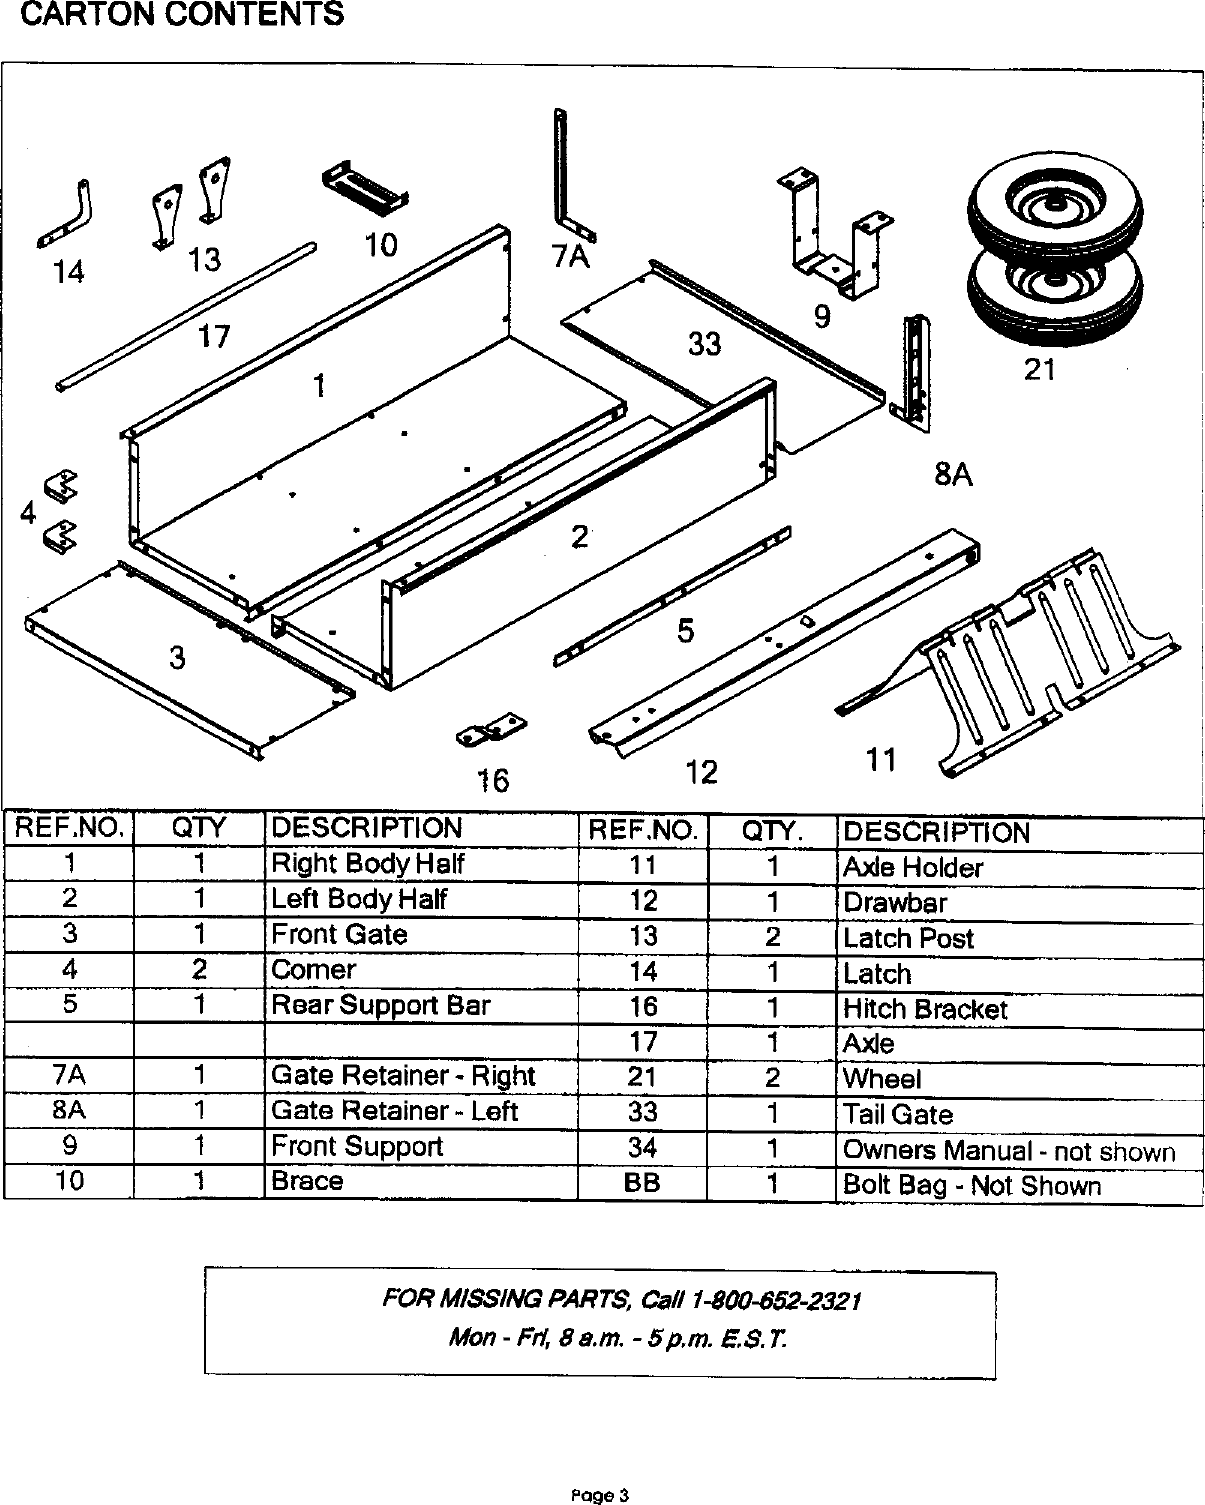 Craftsman 610243551 User Manual DUMP CART Manuals And